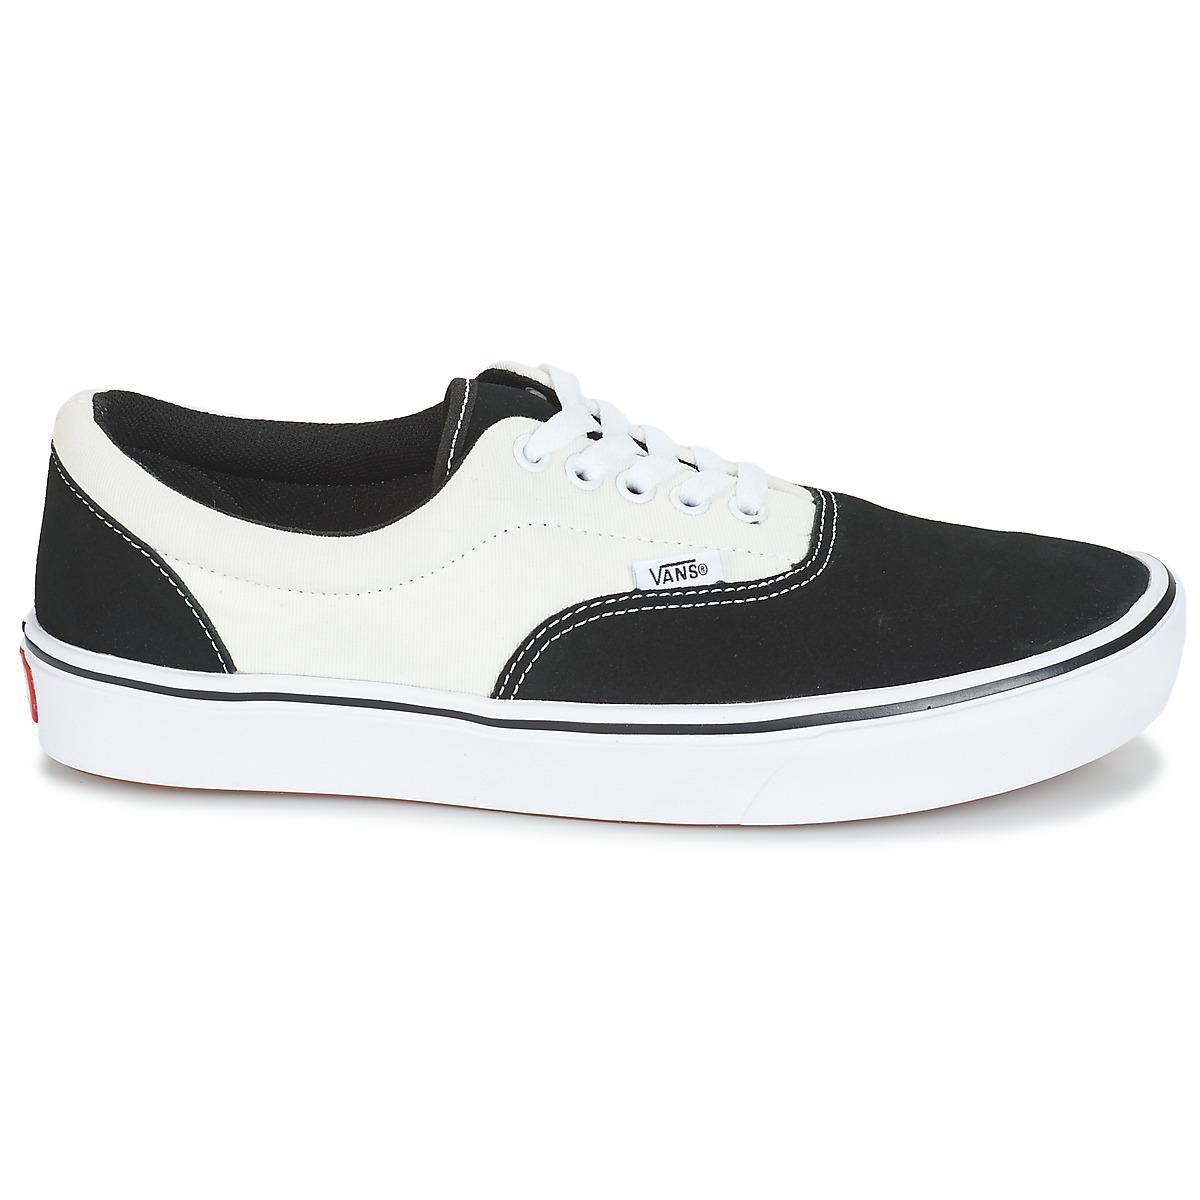 Vans - Comfycush Era Men s Shoes (trainers) In Black for Men - Lyst. View  fullscreen 553fea3ab